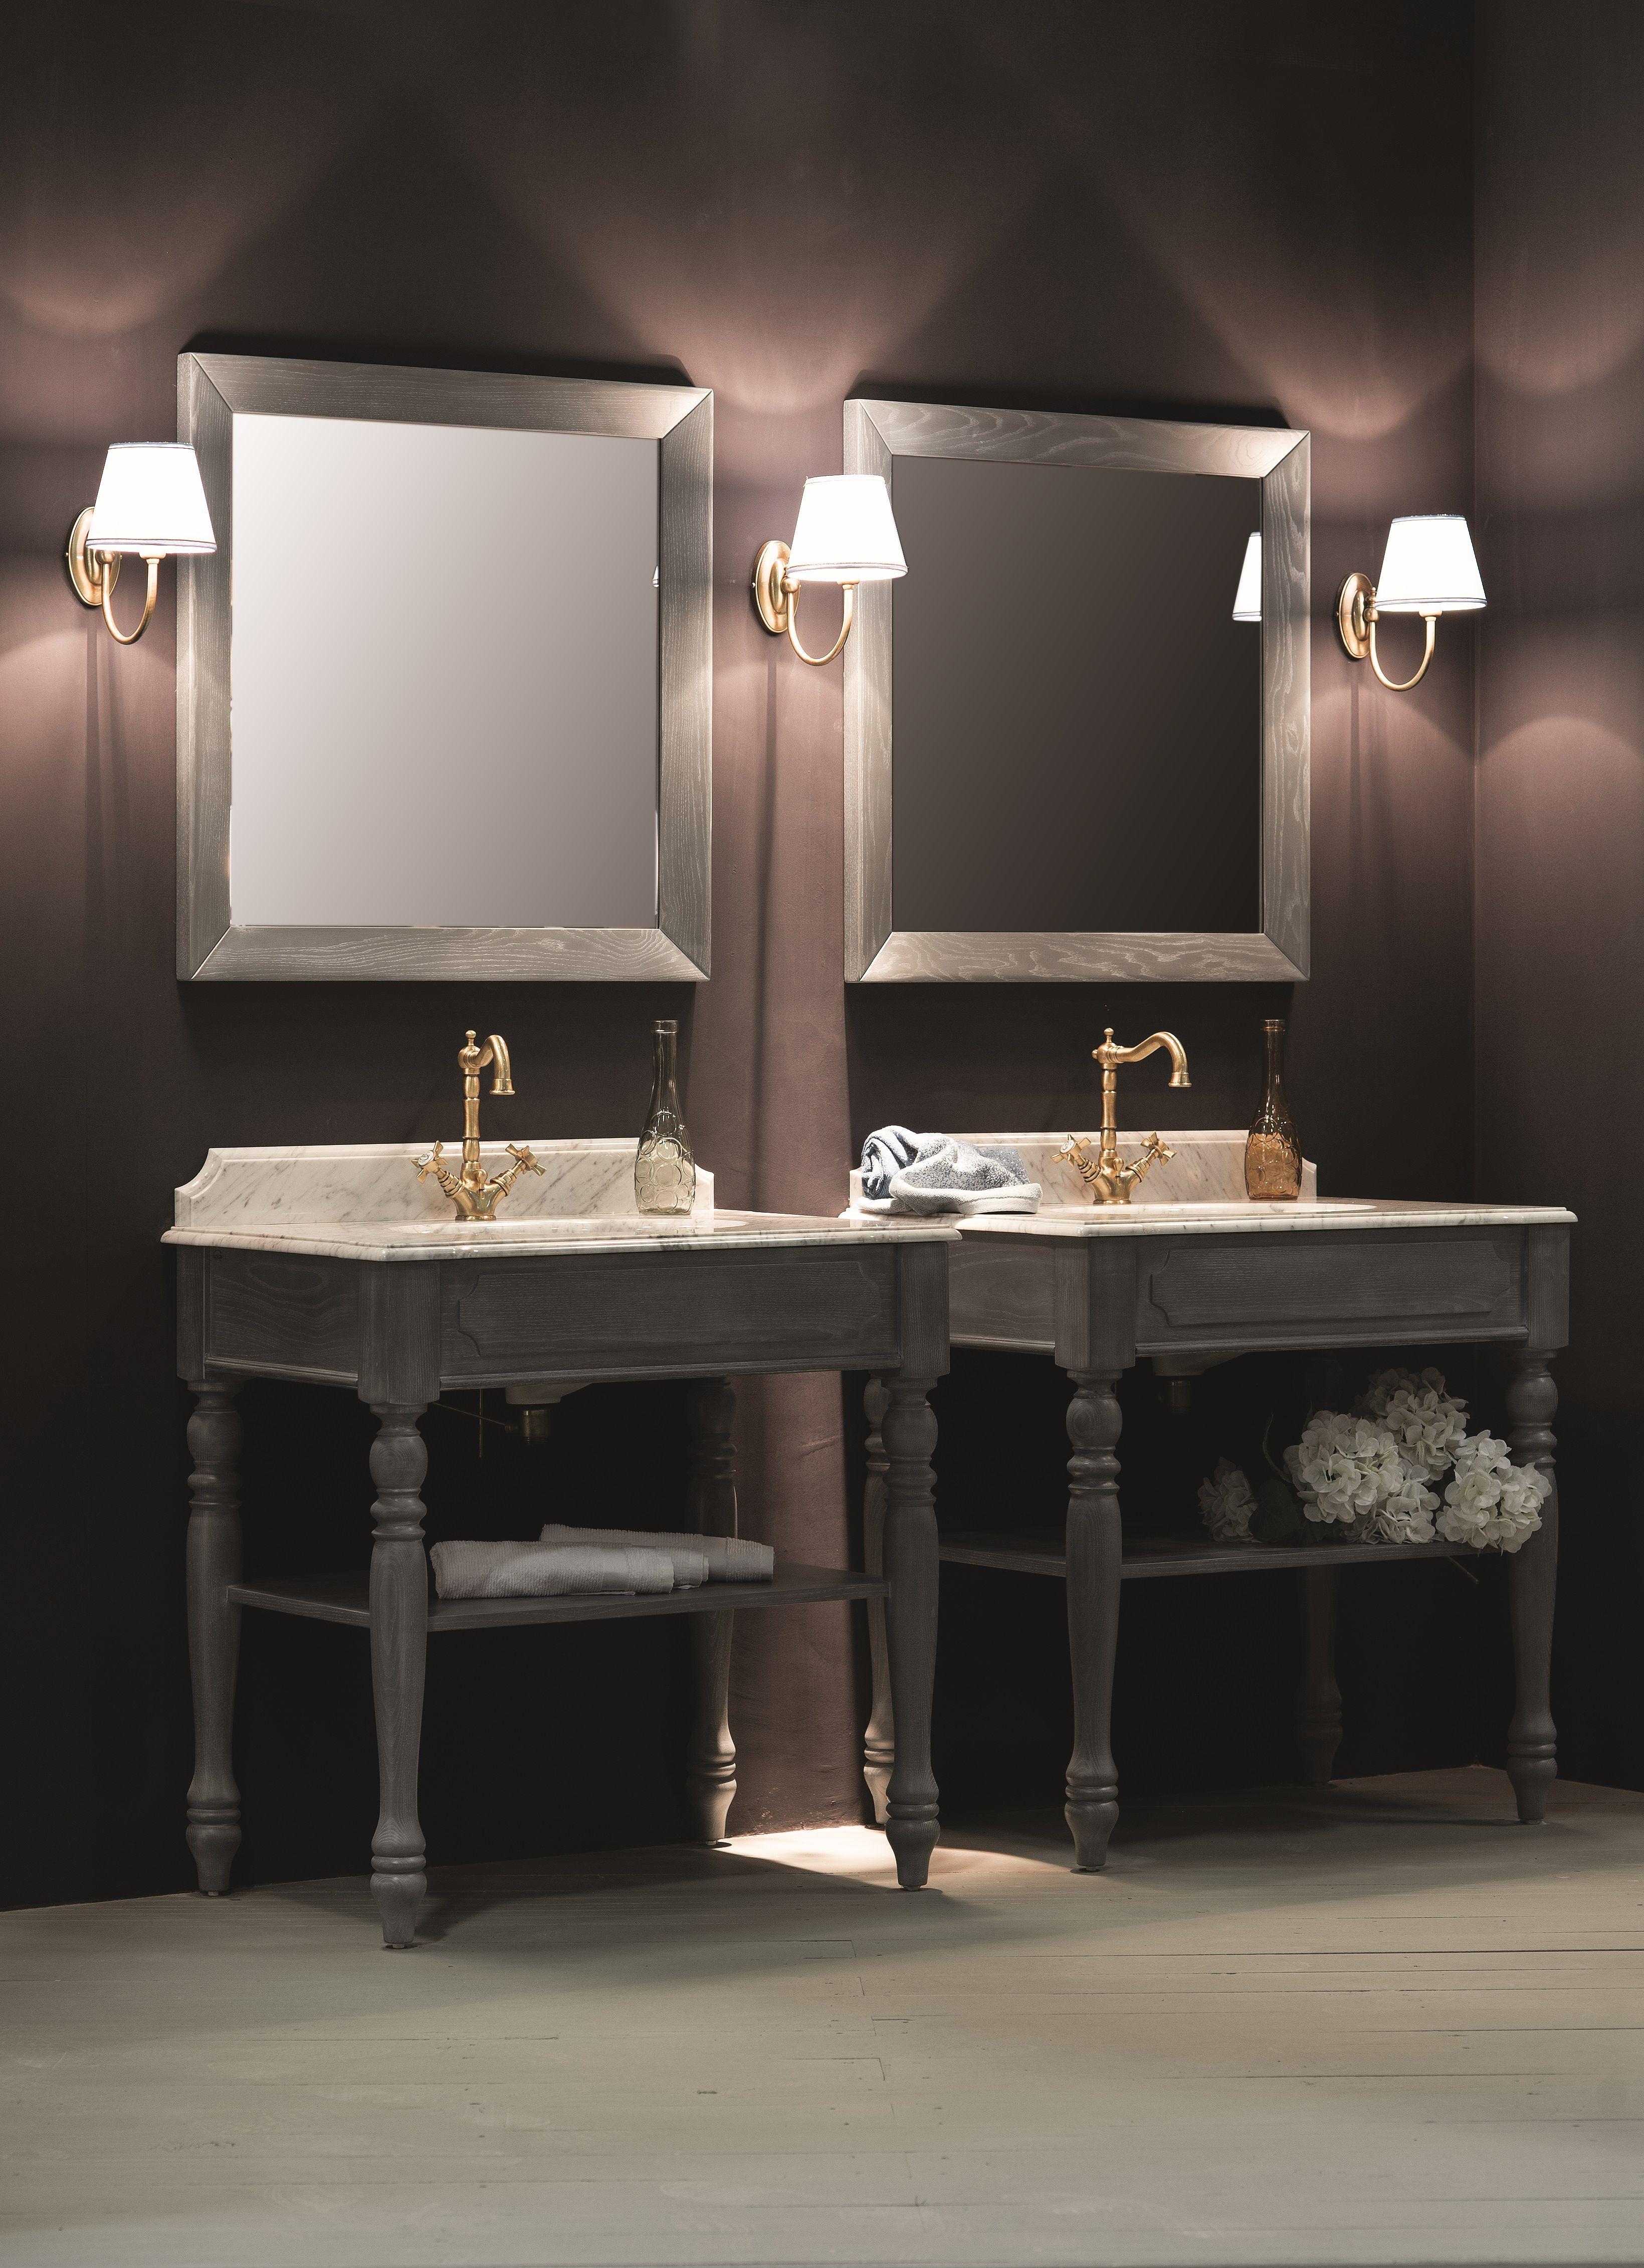 meuble PROVENCAL Bagni completi, Mobile bagno, Mobili